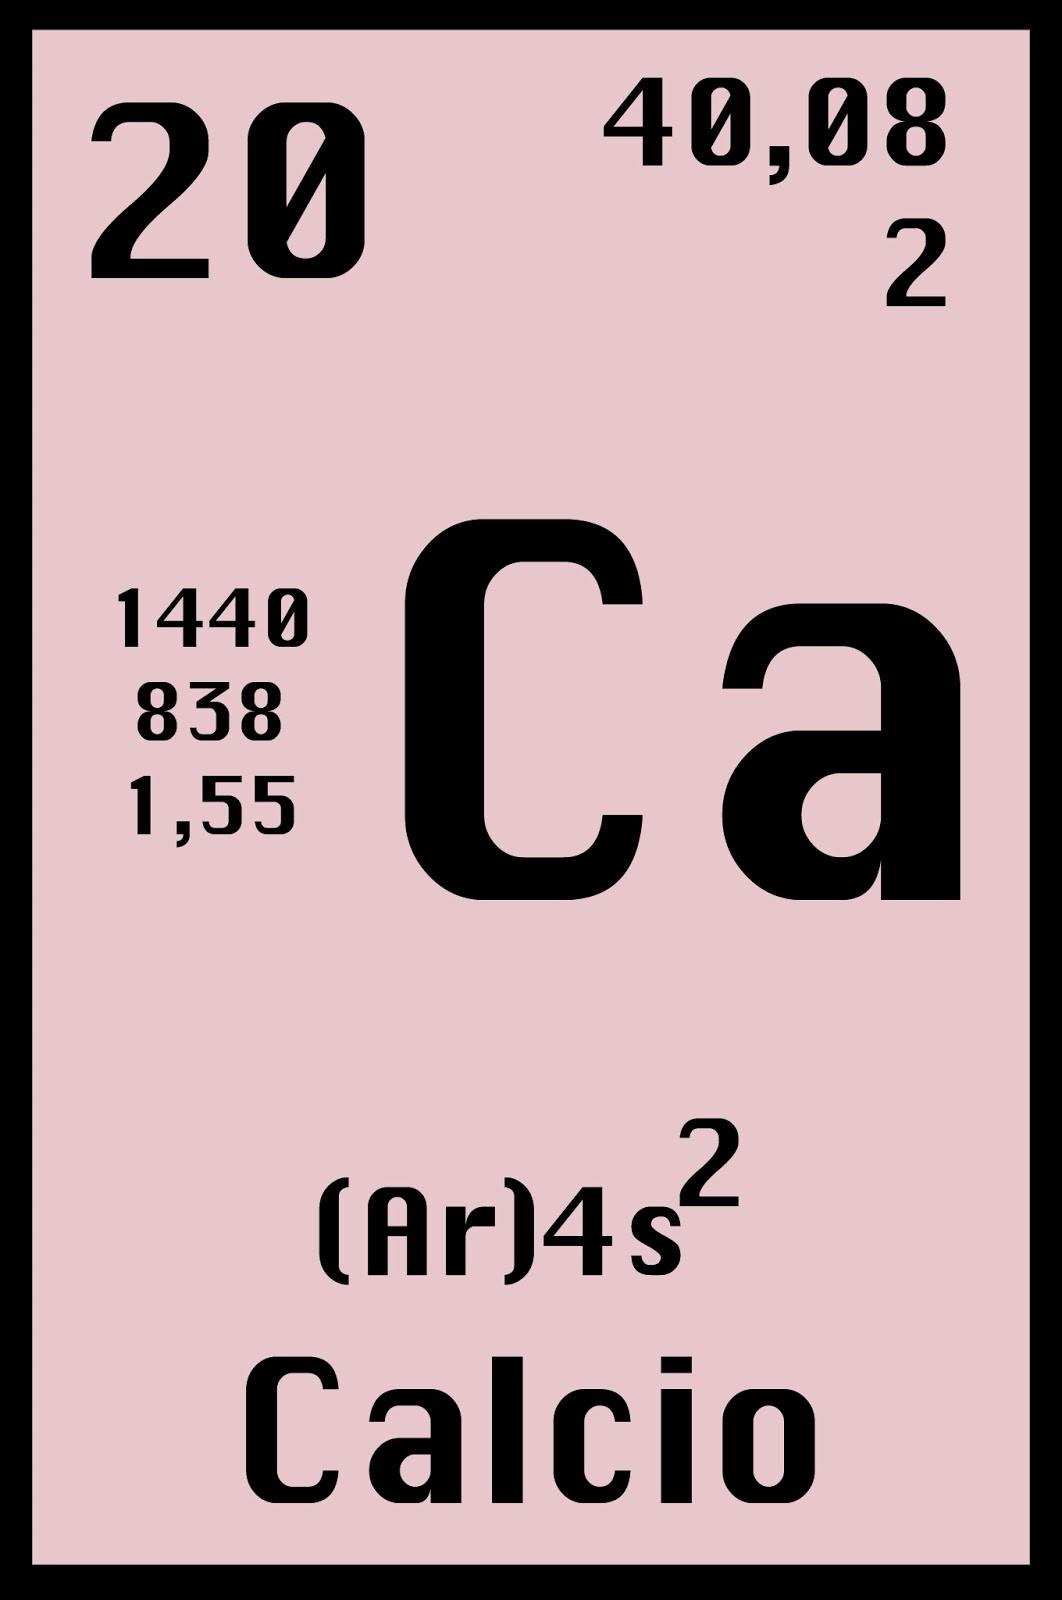 Qumica materiales de laboratorio tics1j elementos de la tabla qumica materiales de laboratorio tics1j urtaz Image collections